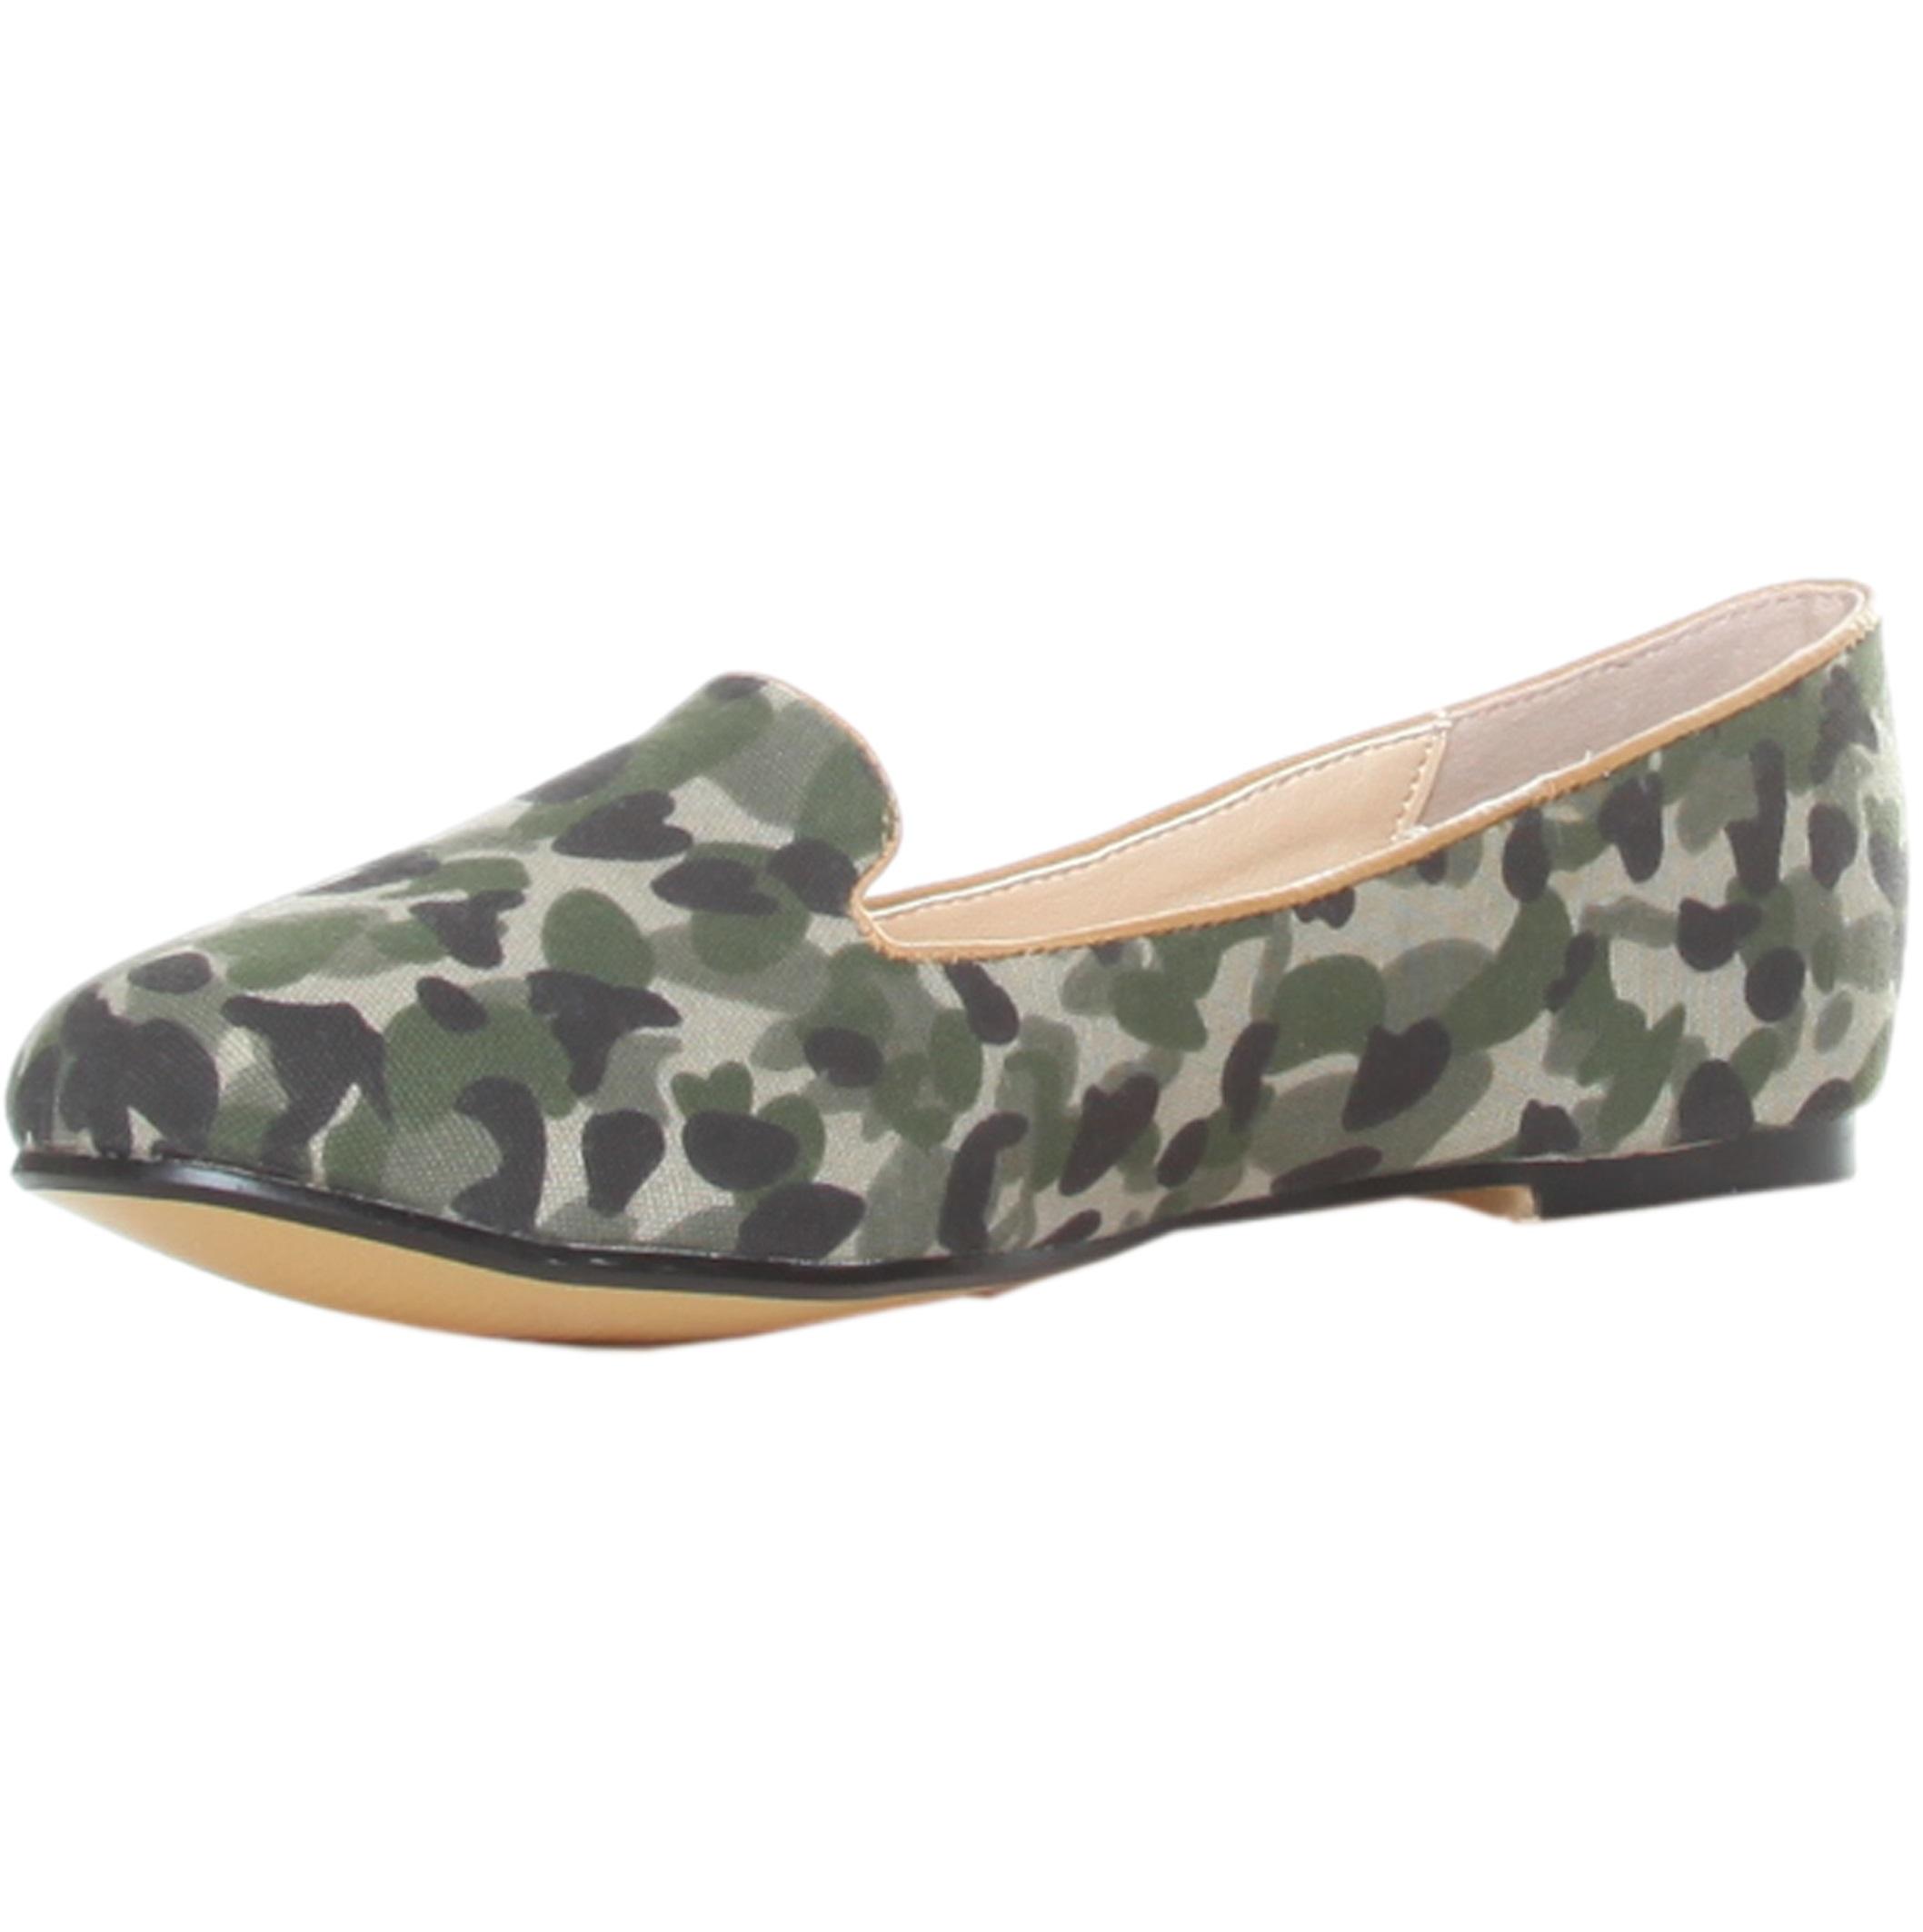 Ana Lublin Flat Shoes Militar Camel Rf600187